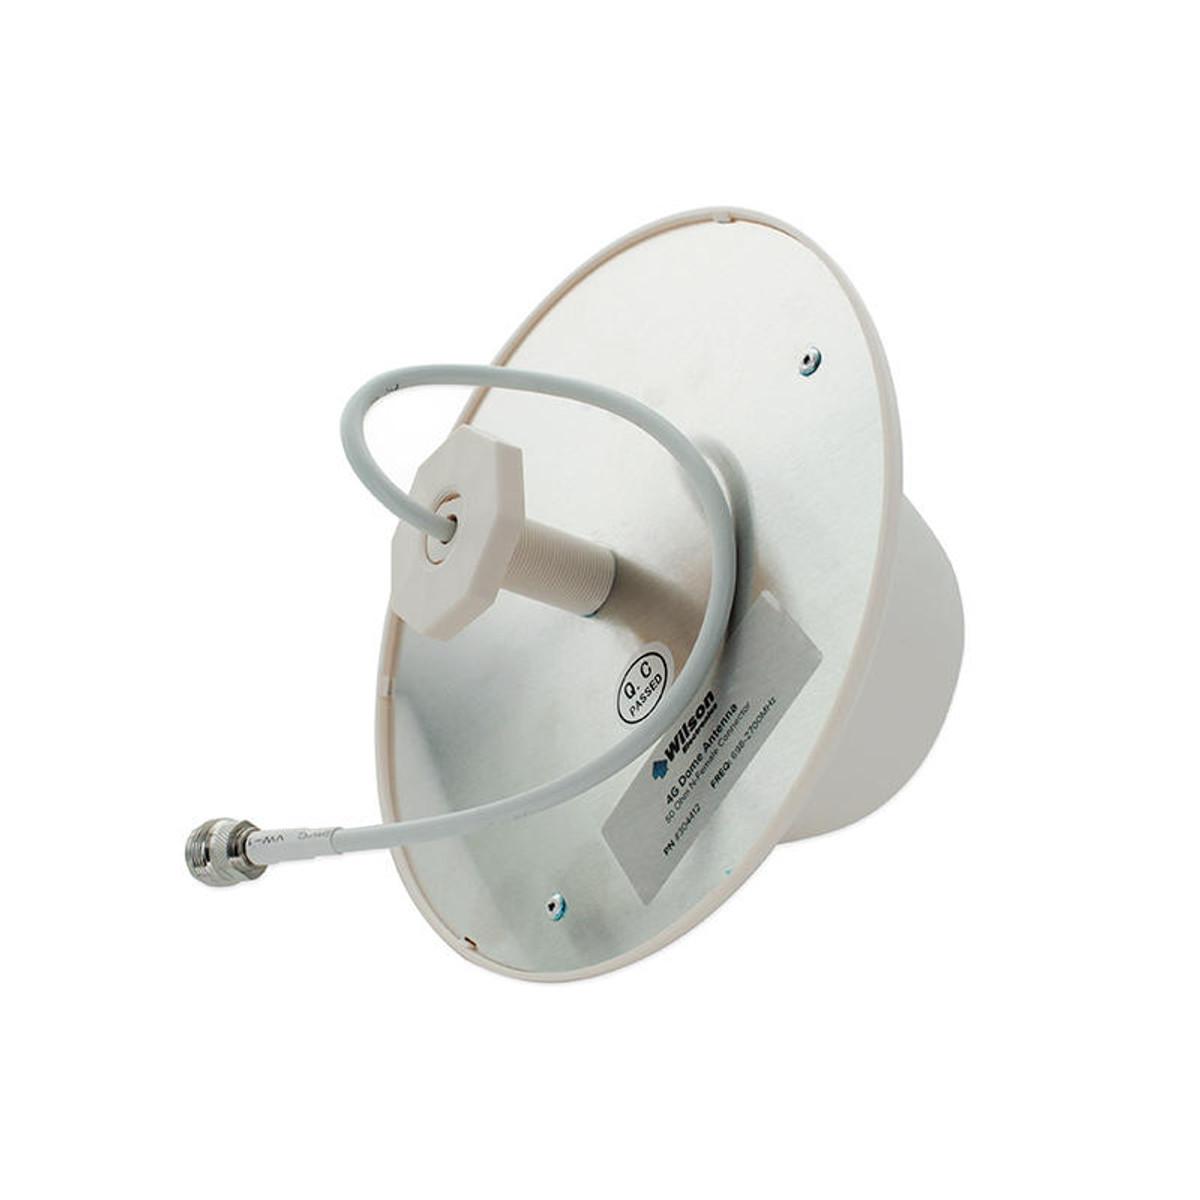 Wilson Electronics Wilson Electronics 4G Dome Ceiling Antenna, 50 Ohm - 304412